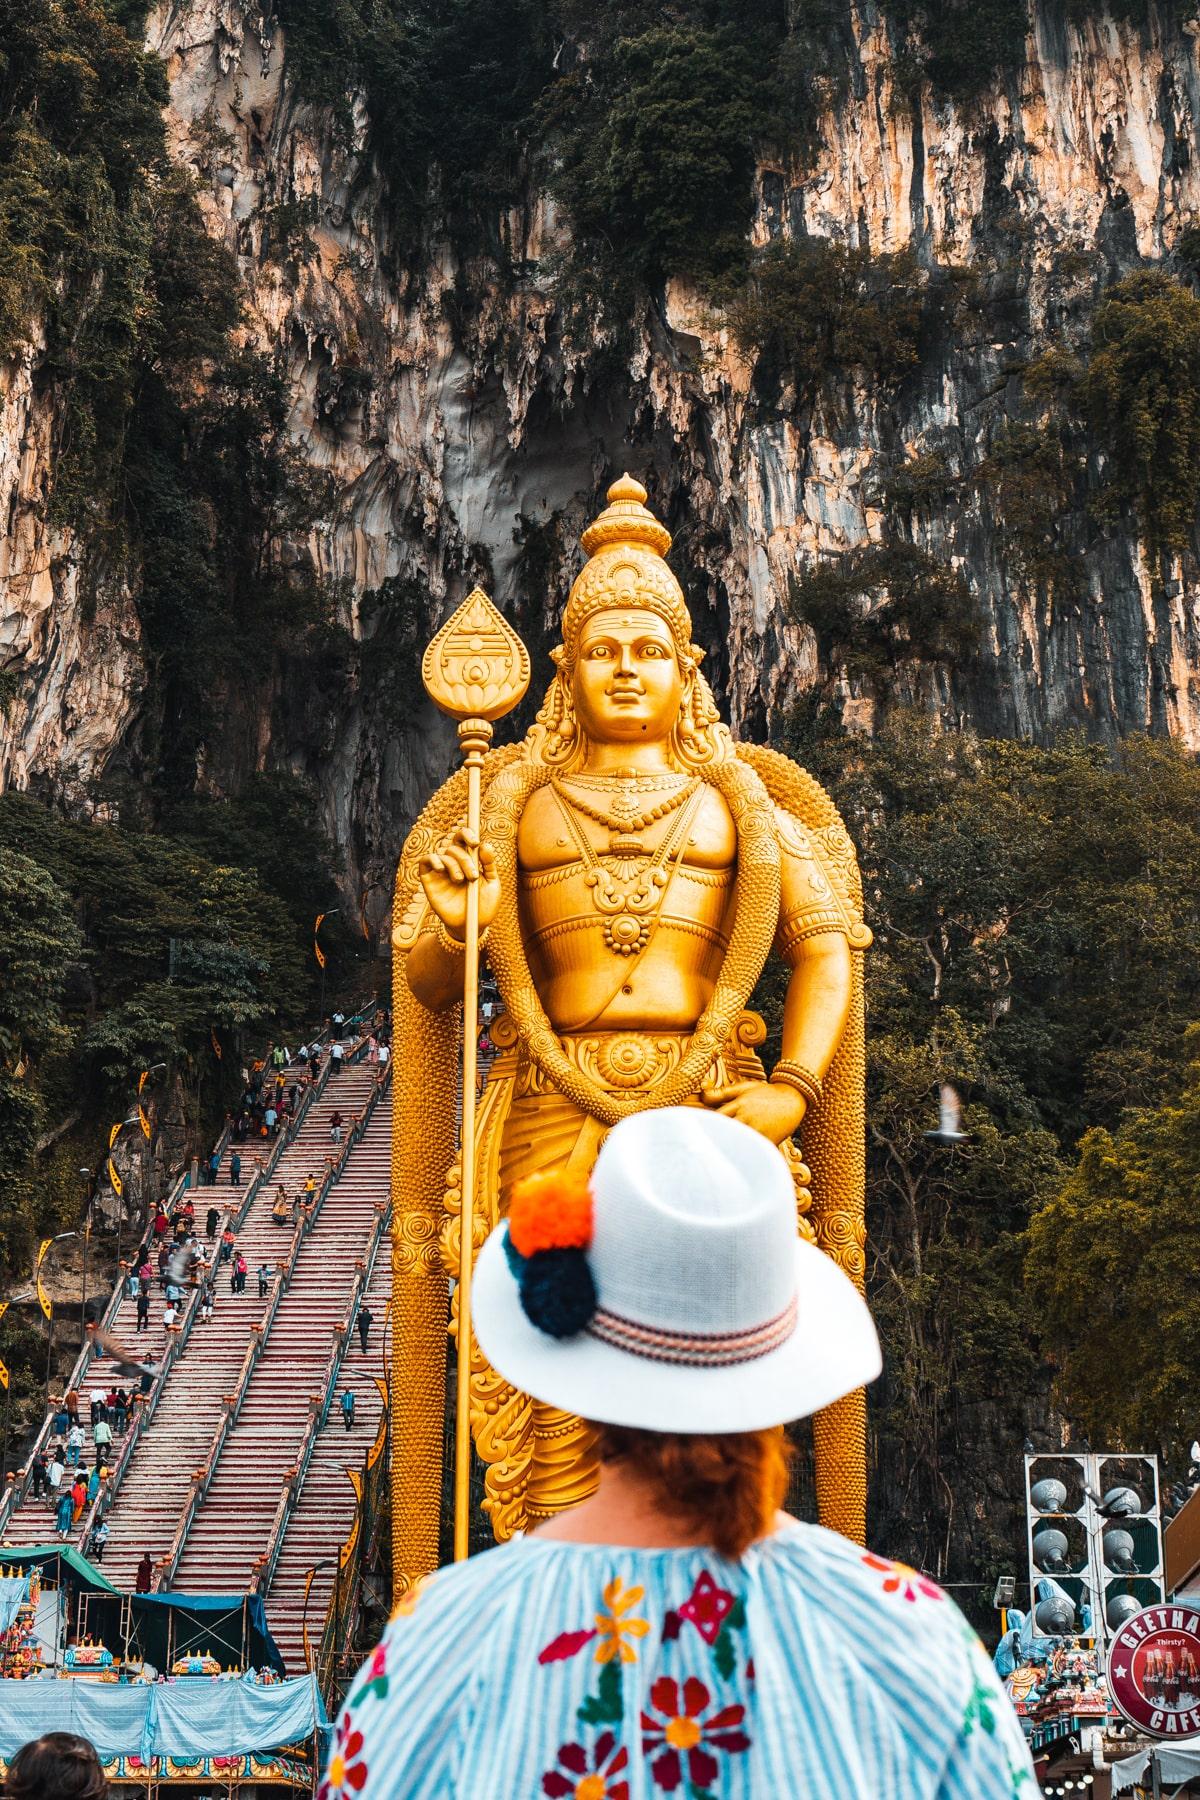 Malaysia Reisetipps - Tagesausflüge ins Umland von Kuala Lumpur